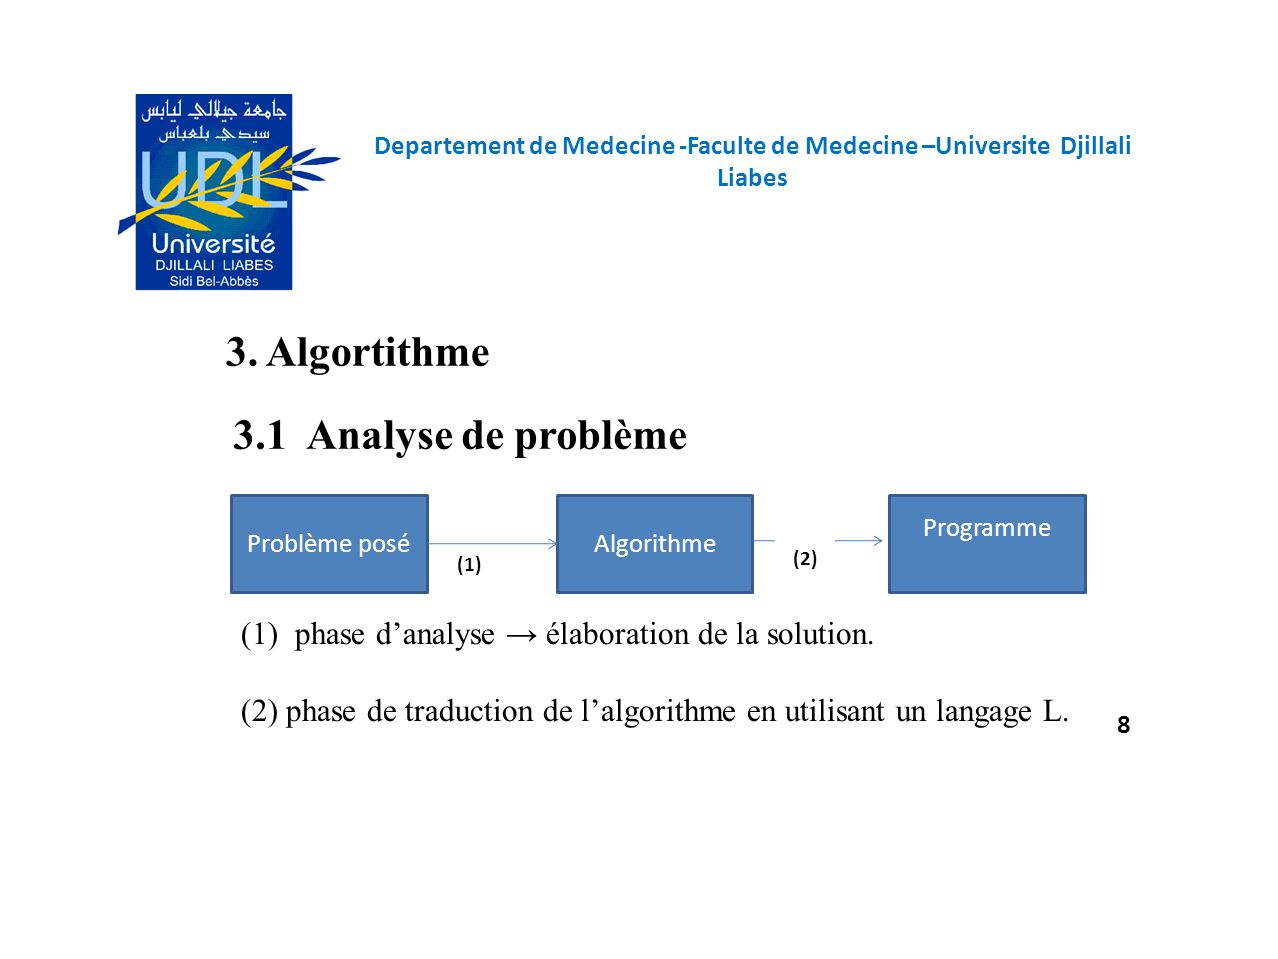 3. Algortithme 3.1 Analyse de problème